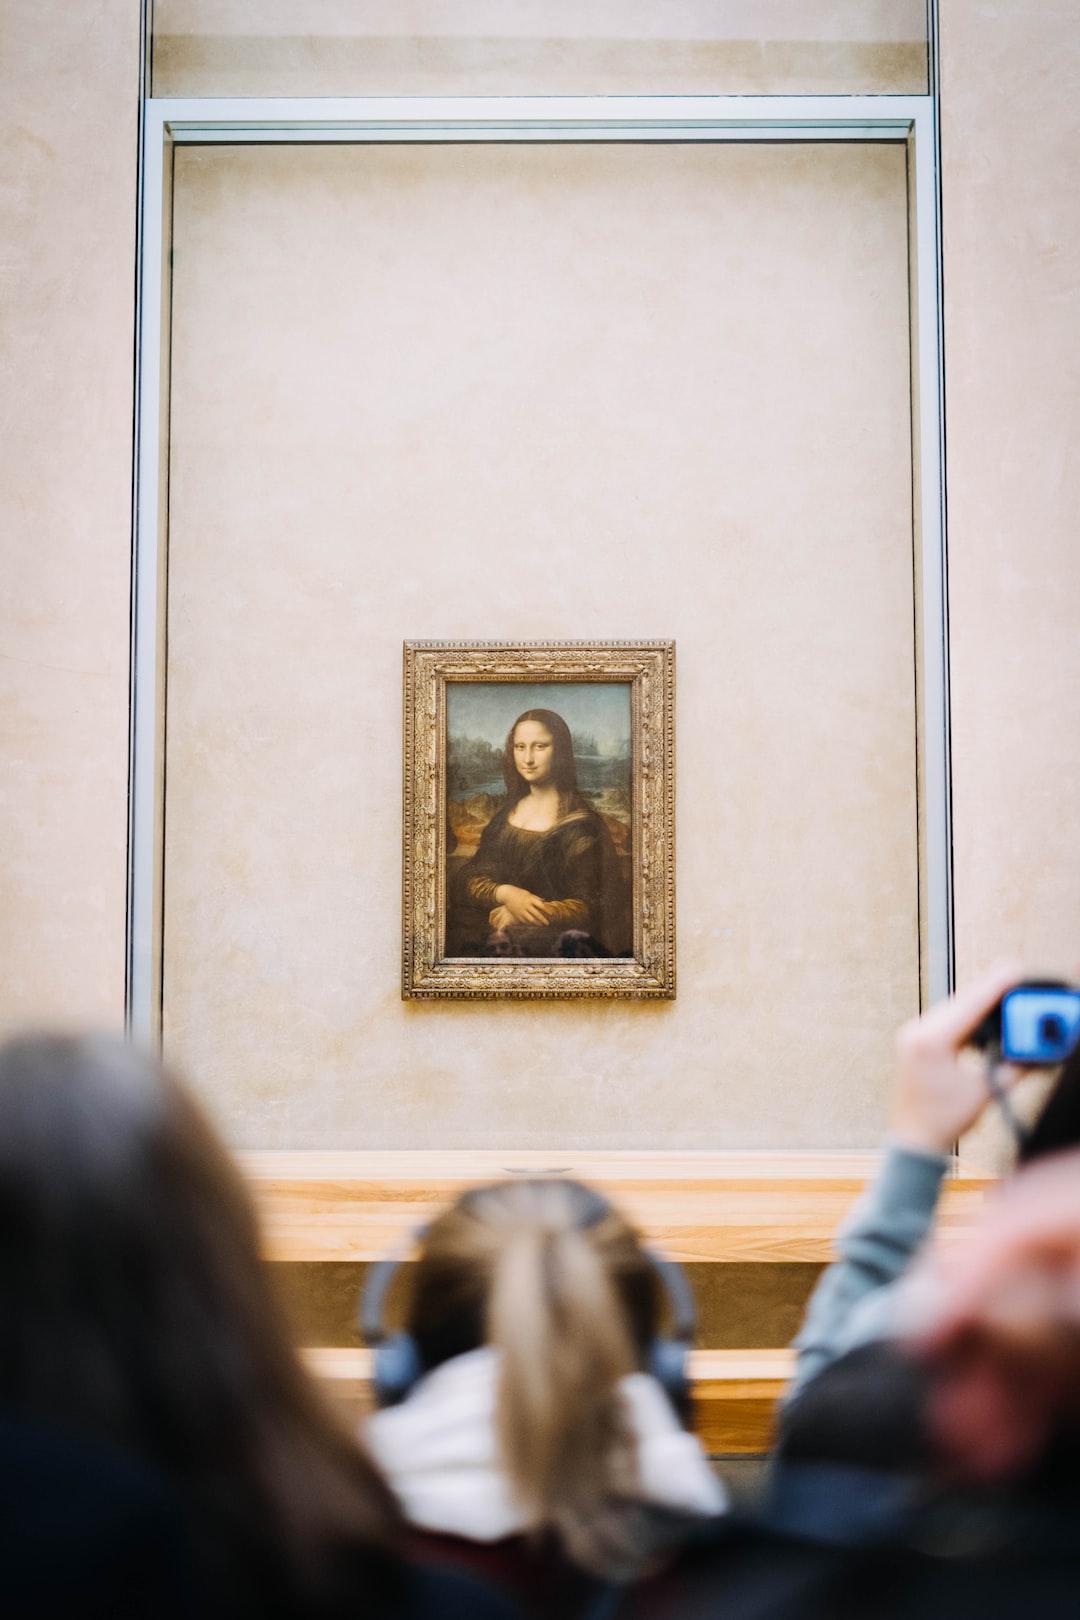 - photo 1559177612 15e1d7e4b0c3 ixlib rb 1 - Mona Lisa amongst the crowd   HD photo by Zach Dyson (@zachdyson) on Unsplash